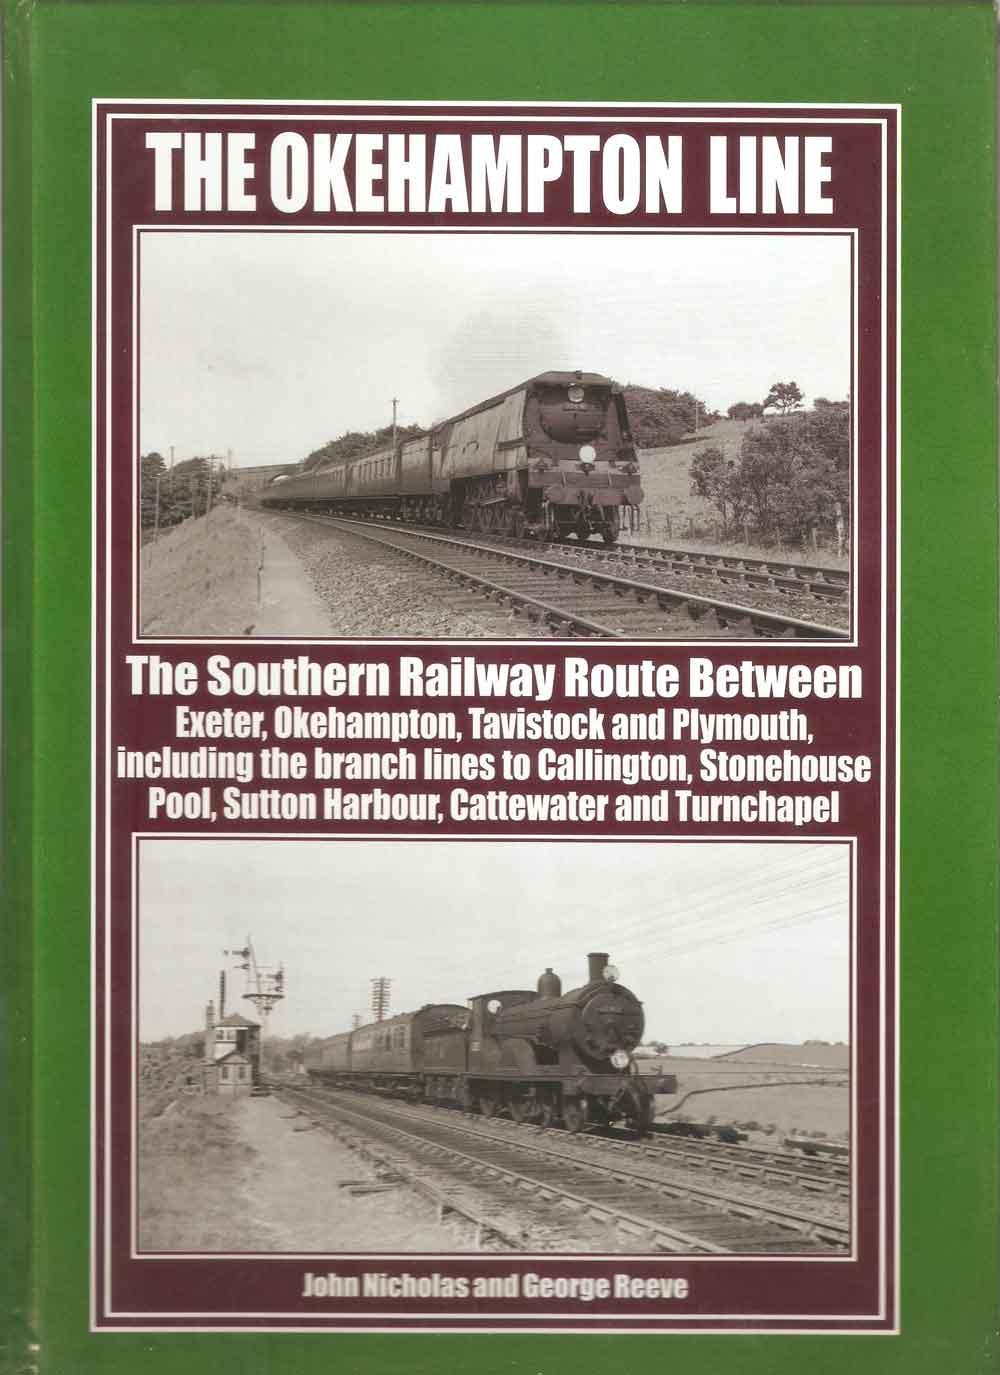 The Okehampton Line book cover